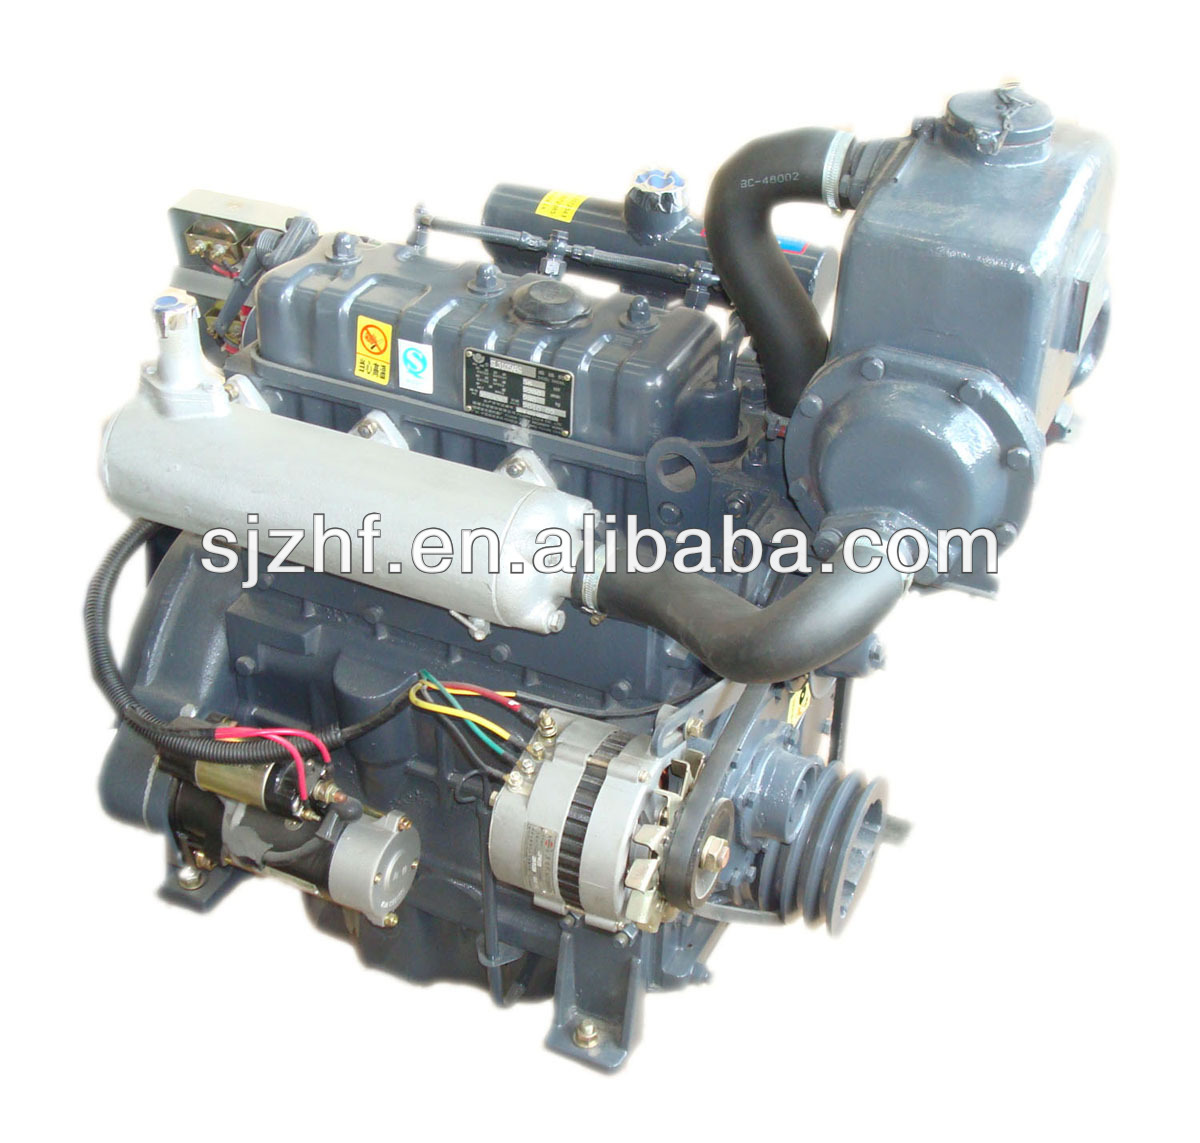 Sl3105abc Small Marine Diesel Engine - Buy Small Marine ...